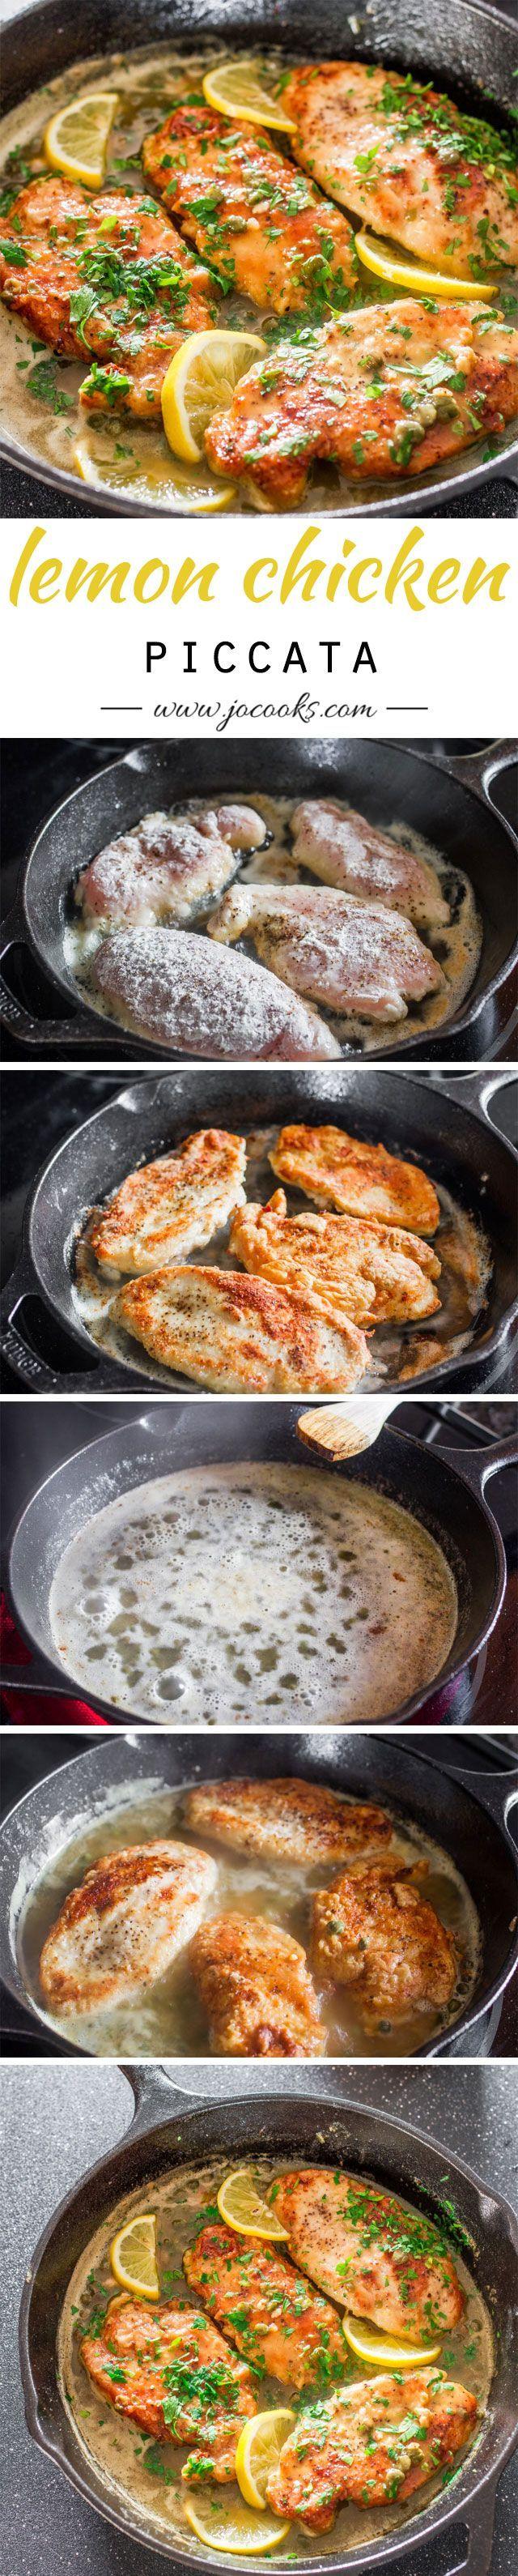 Lemon Chicken Piccata - Dan 330